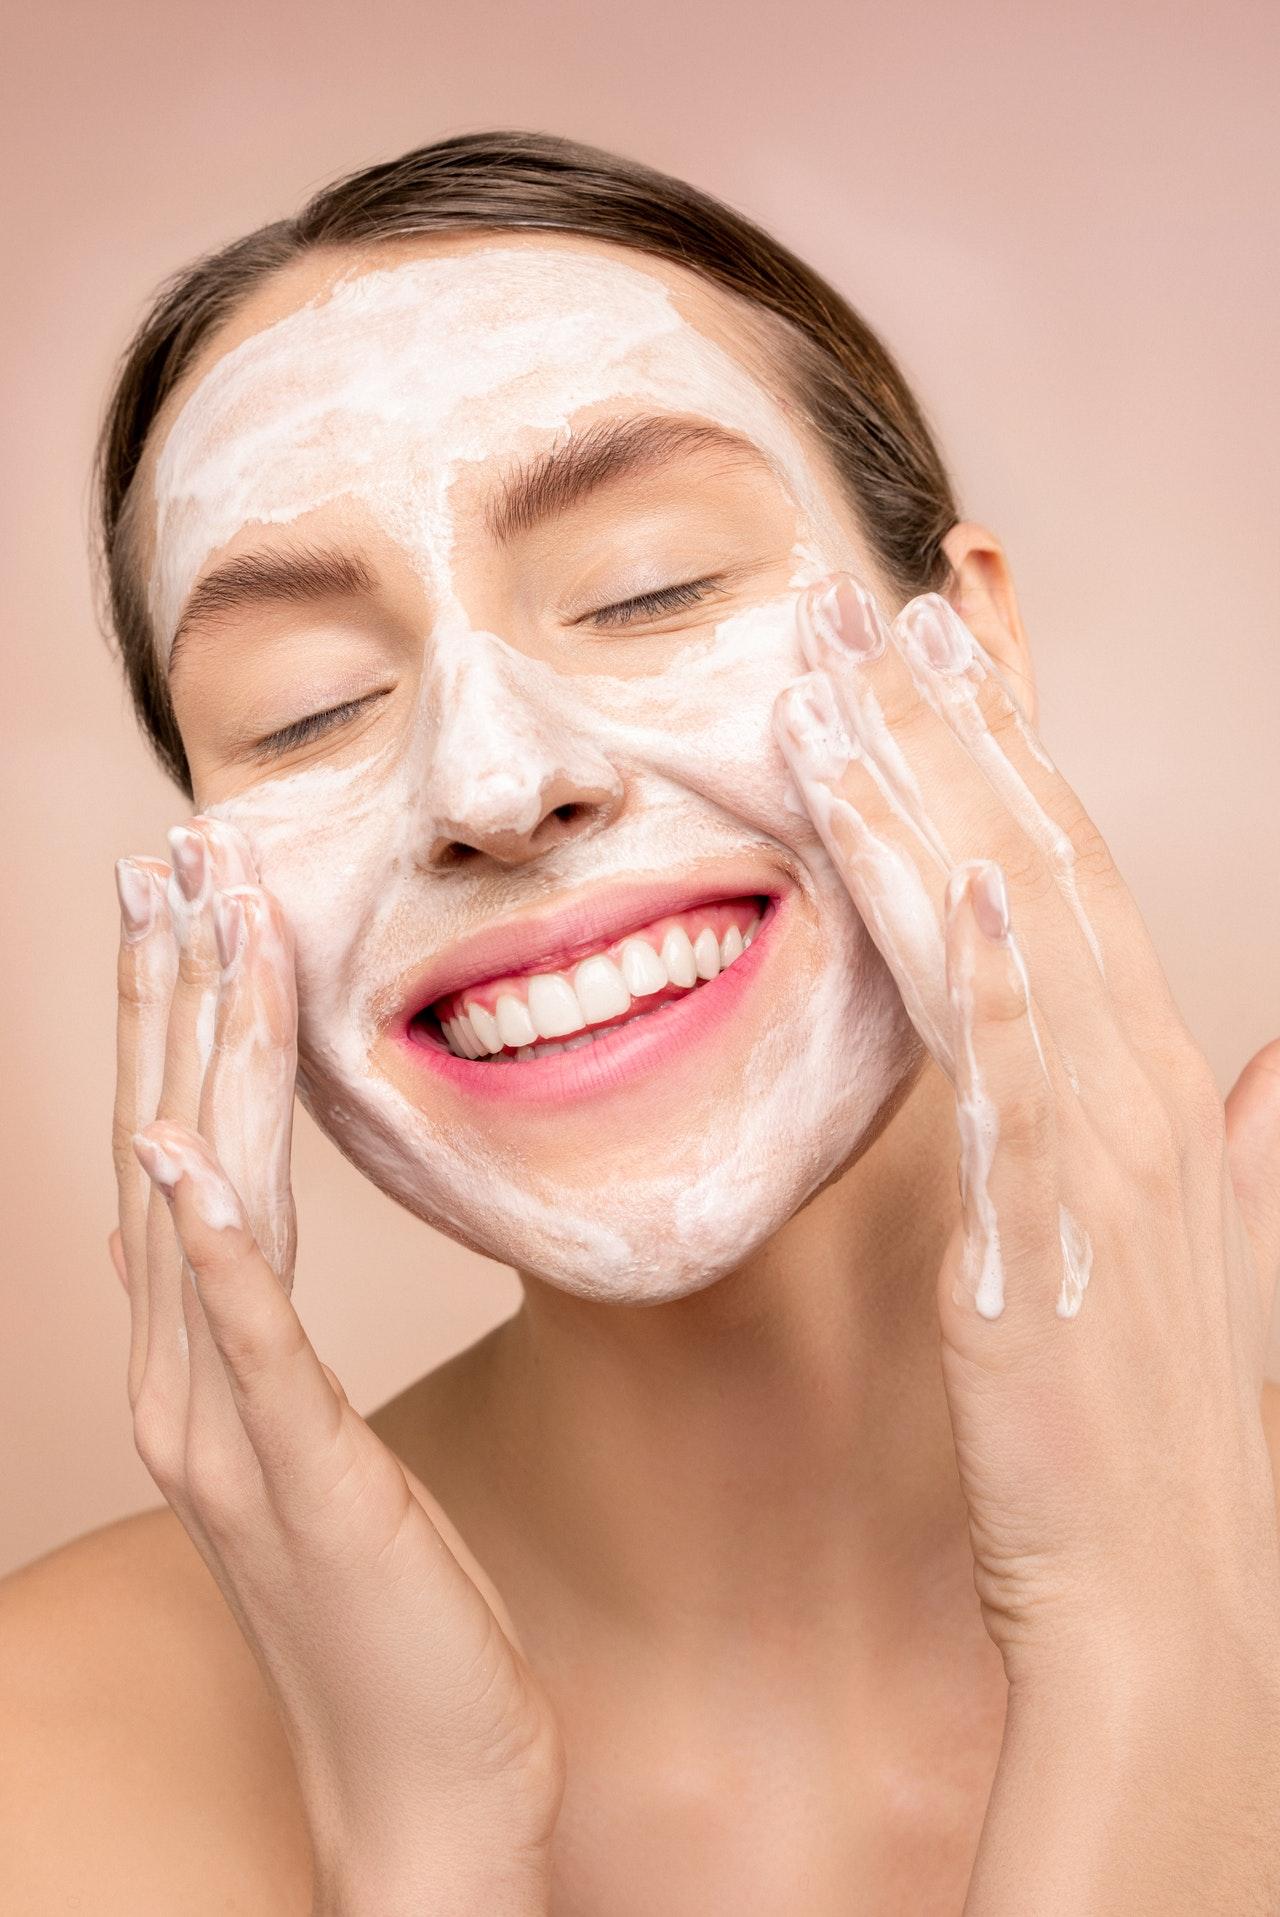 Maschera viso fai da te per una pelle radiosa